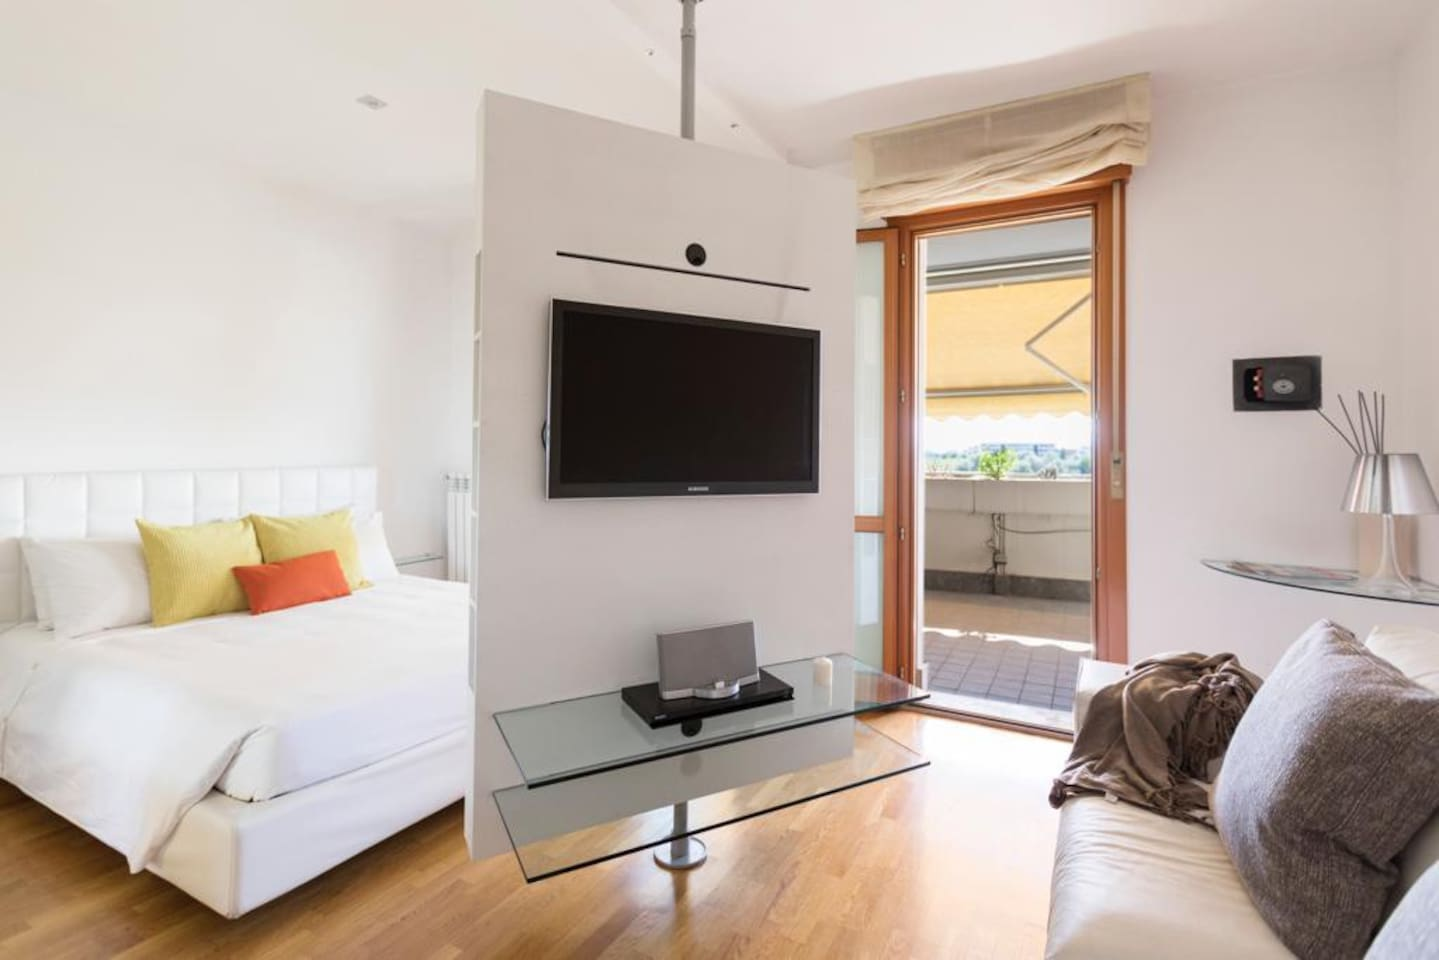 Parete girevole porta TV/swivel TV stand-separates the sleeping area from the living area